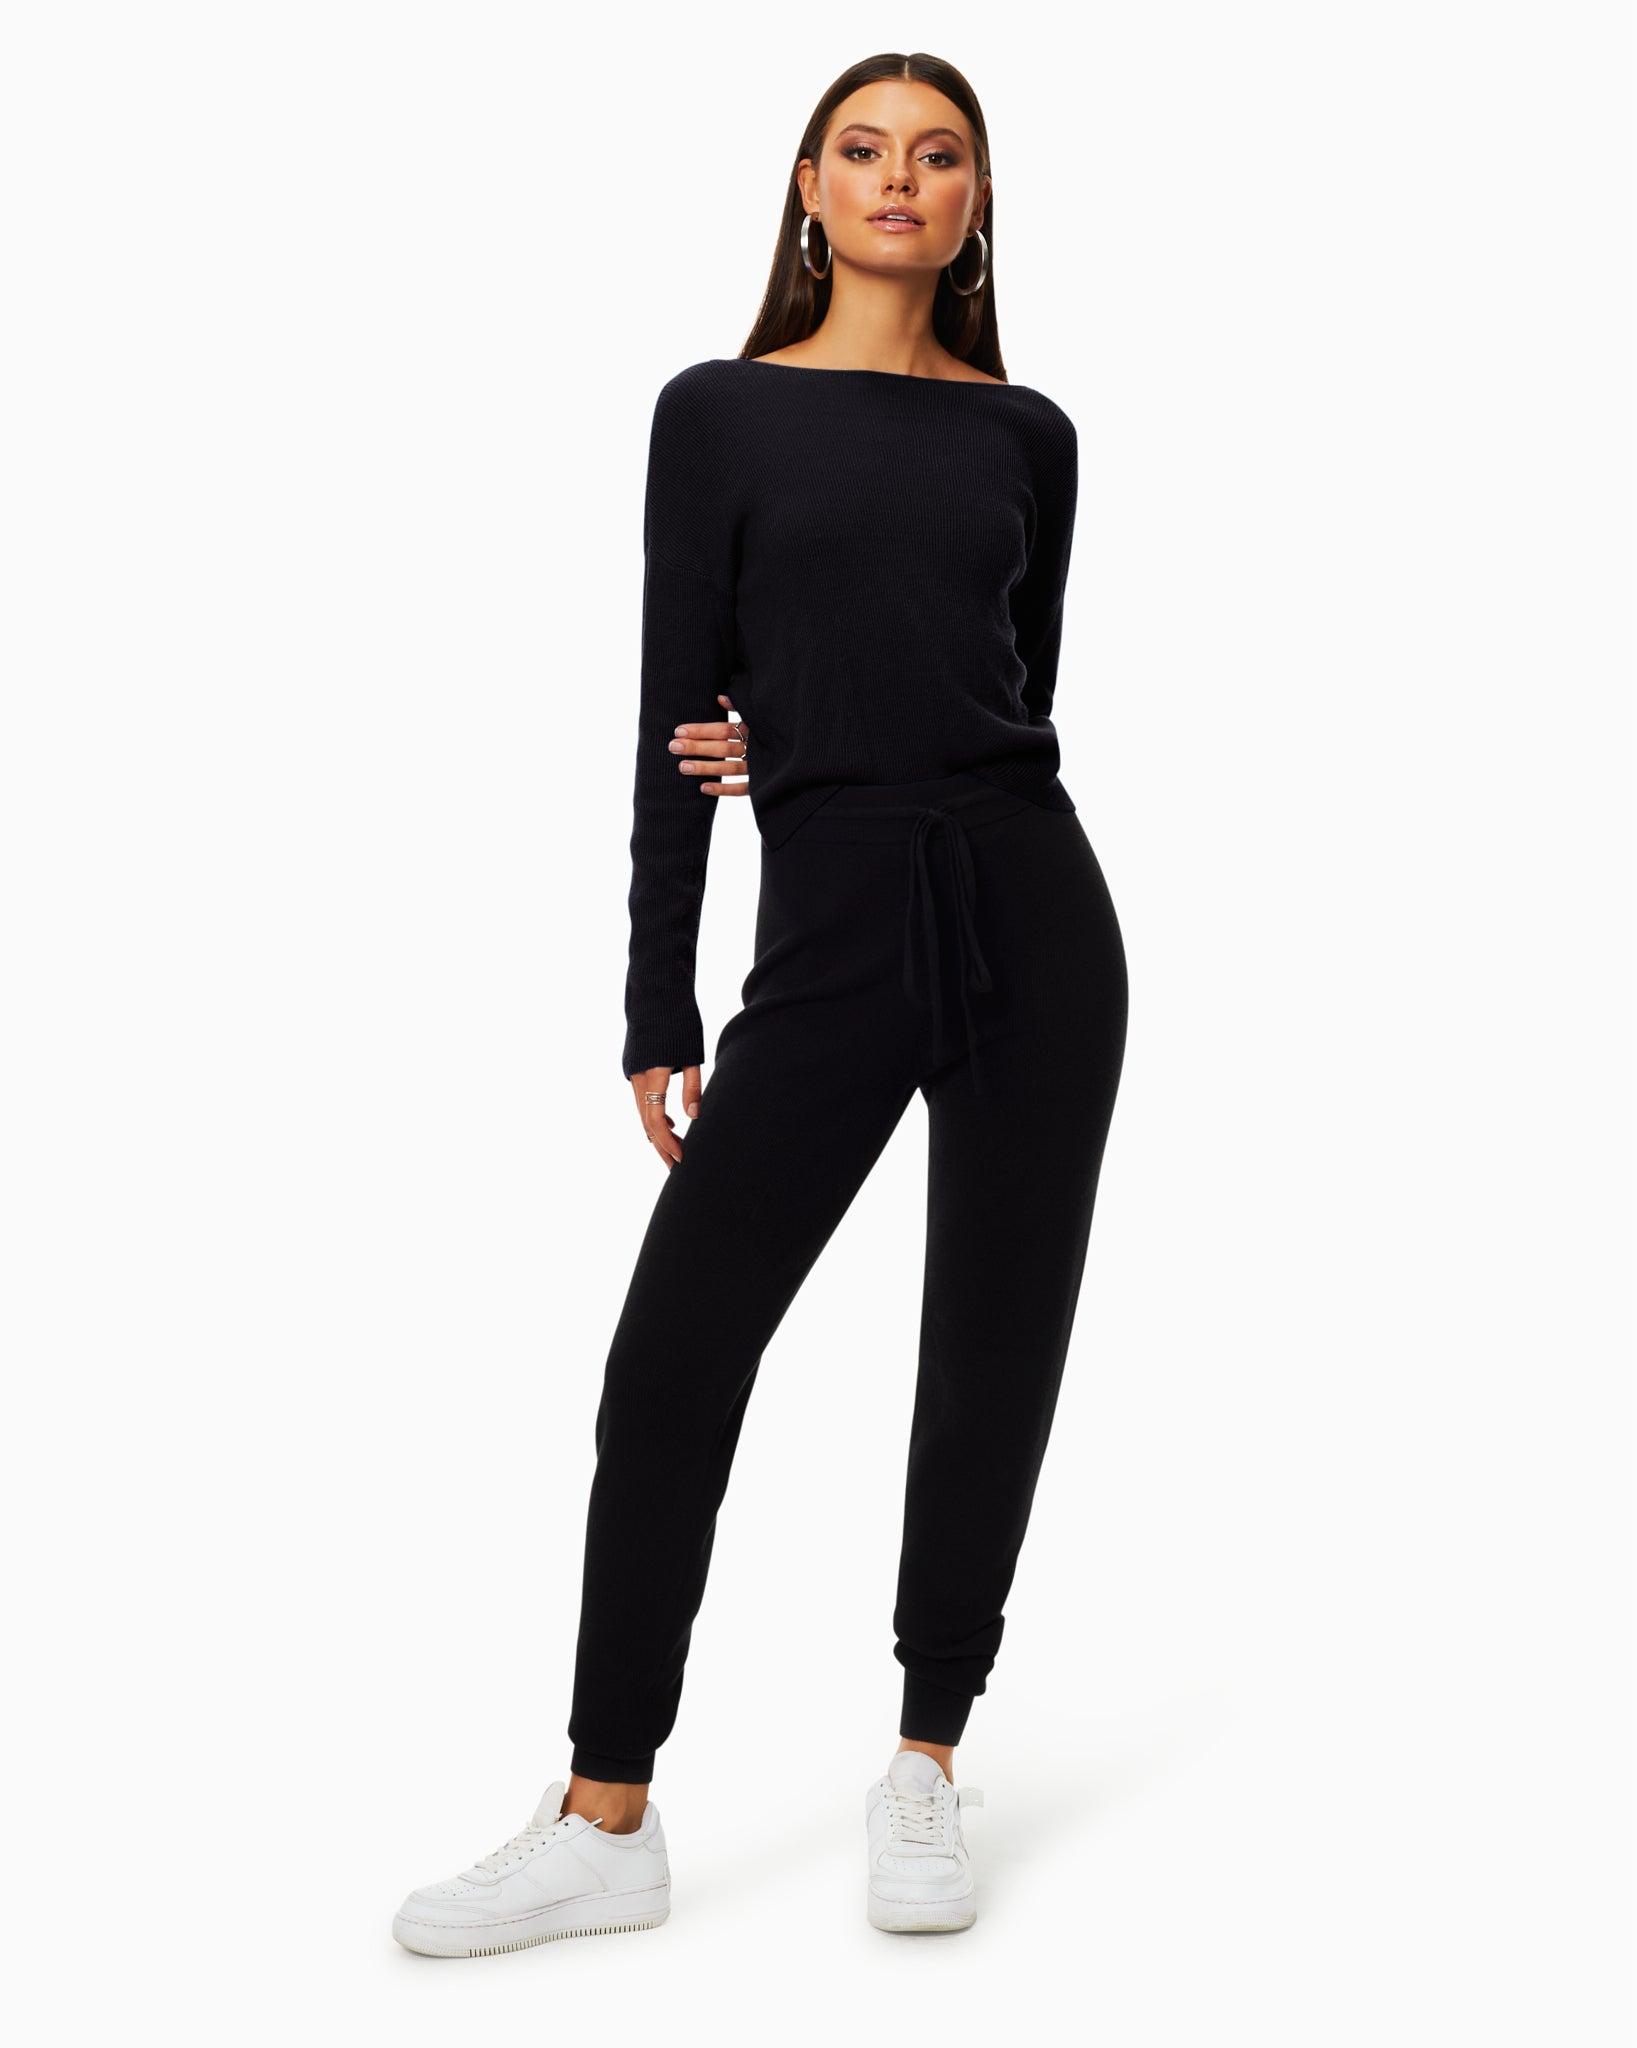 Landon Knit Jogger in Black - Black - Size: S